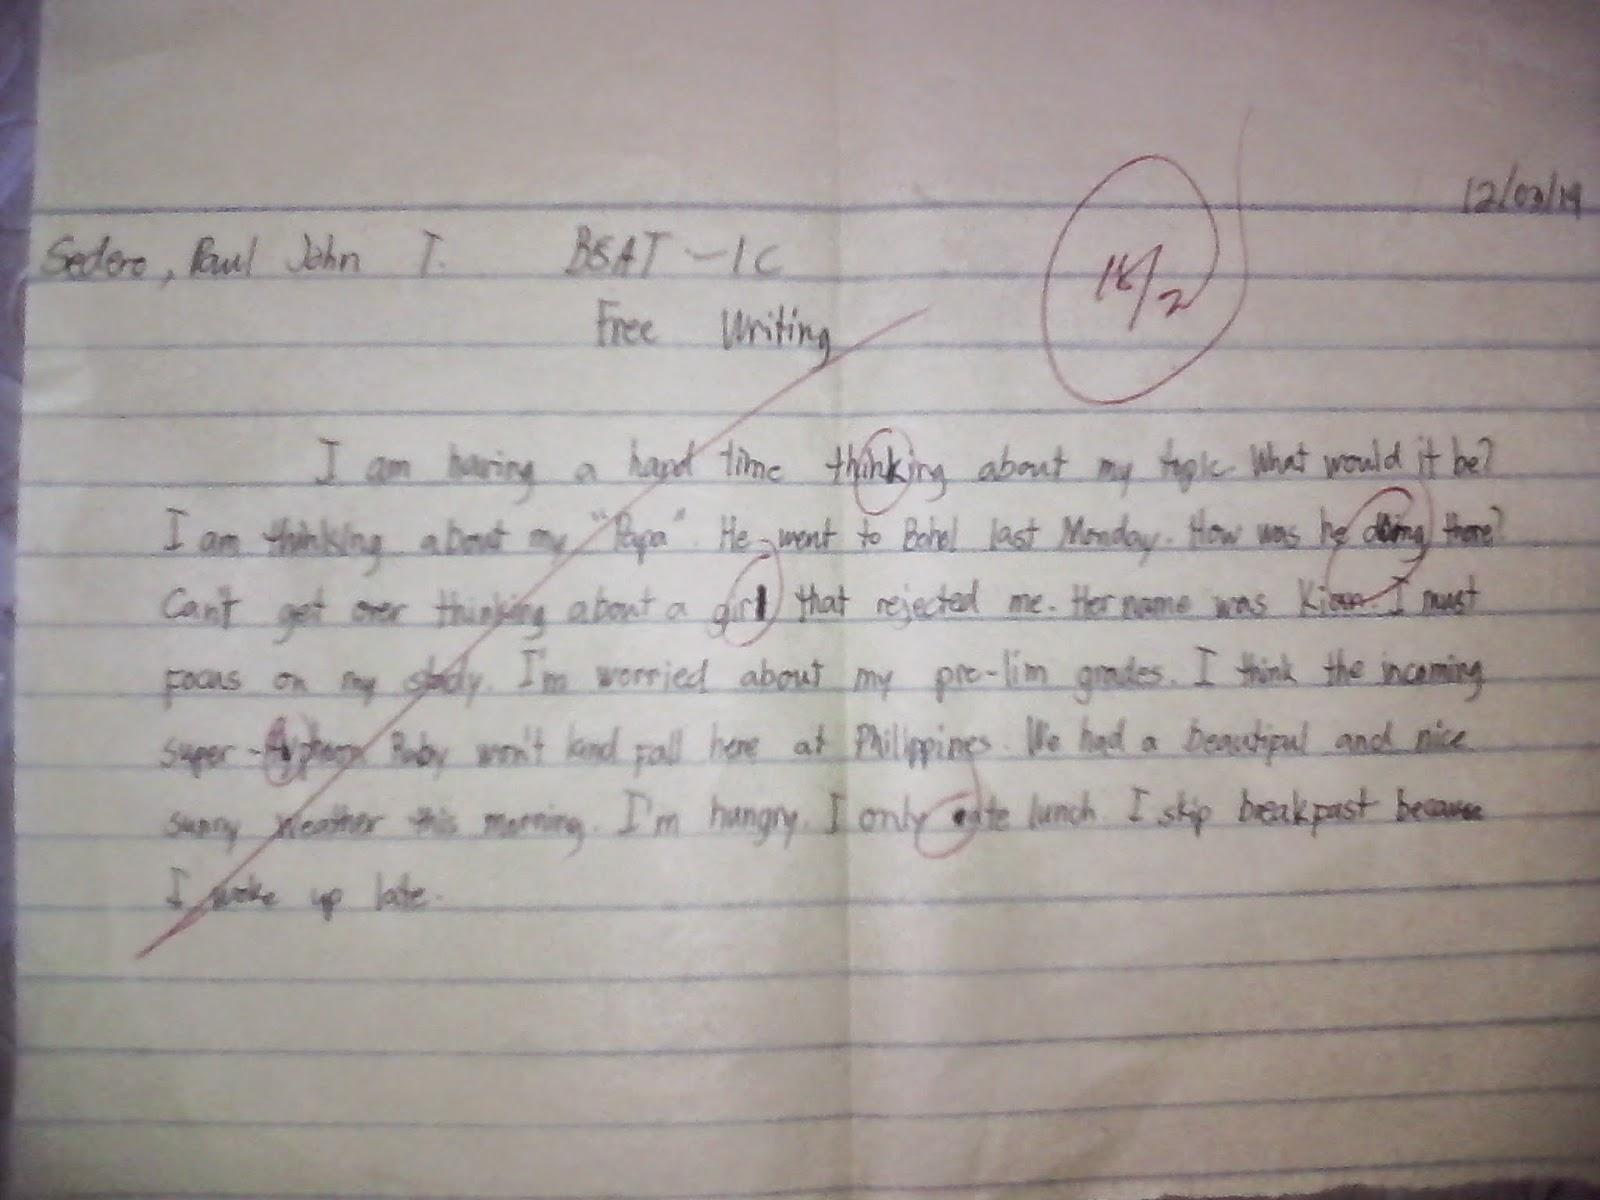 Short essay on discipline for students